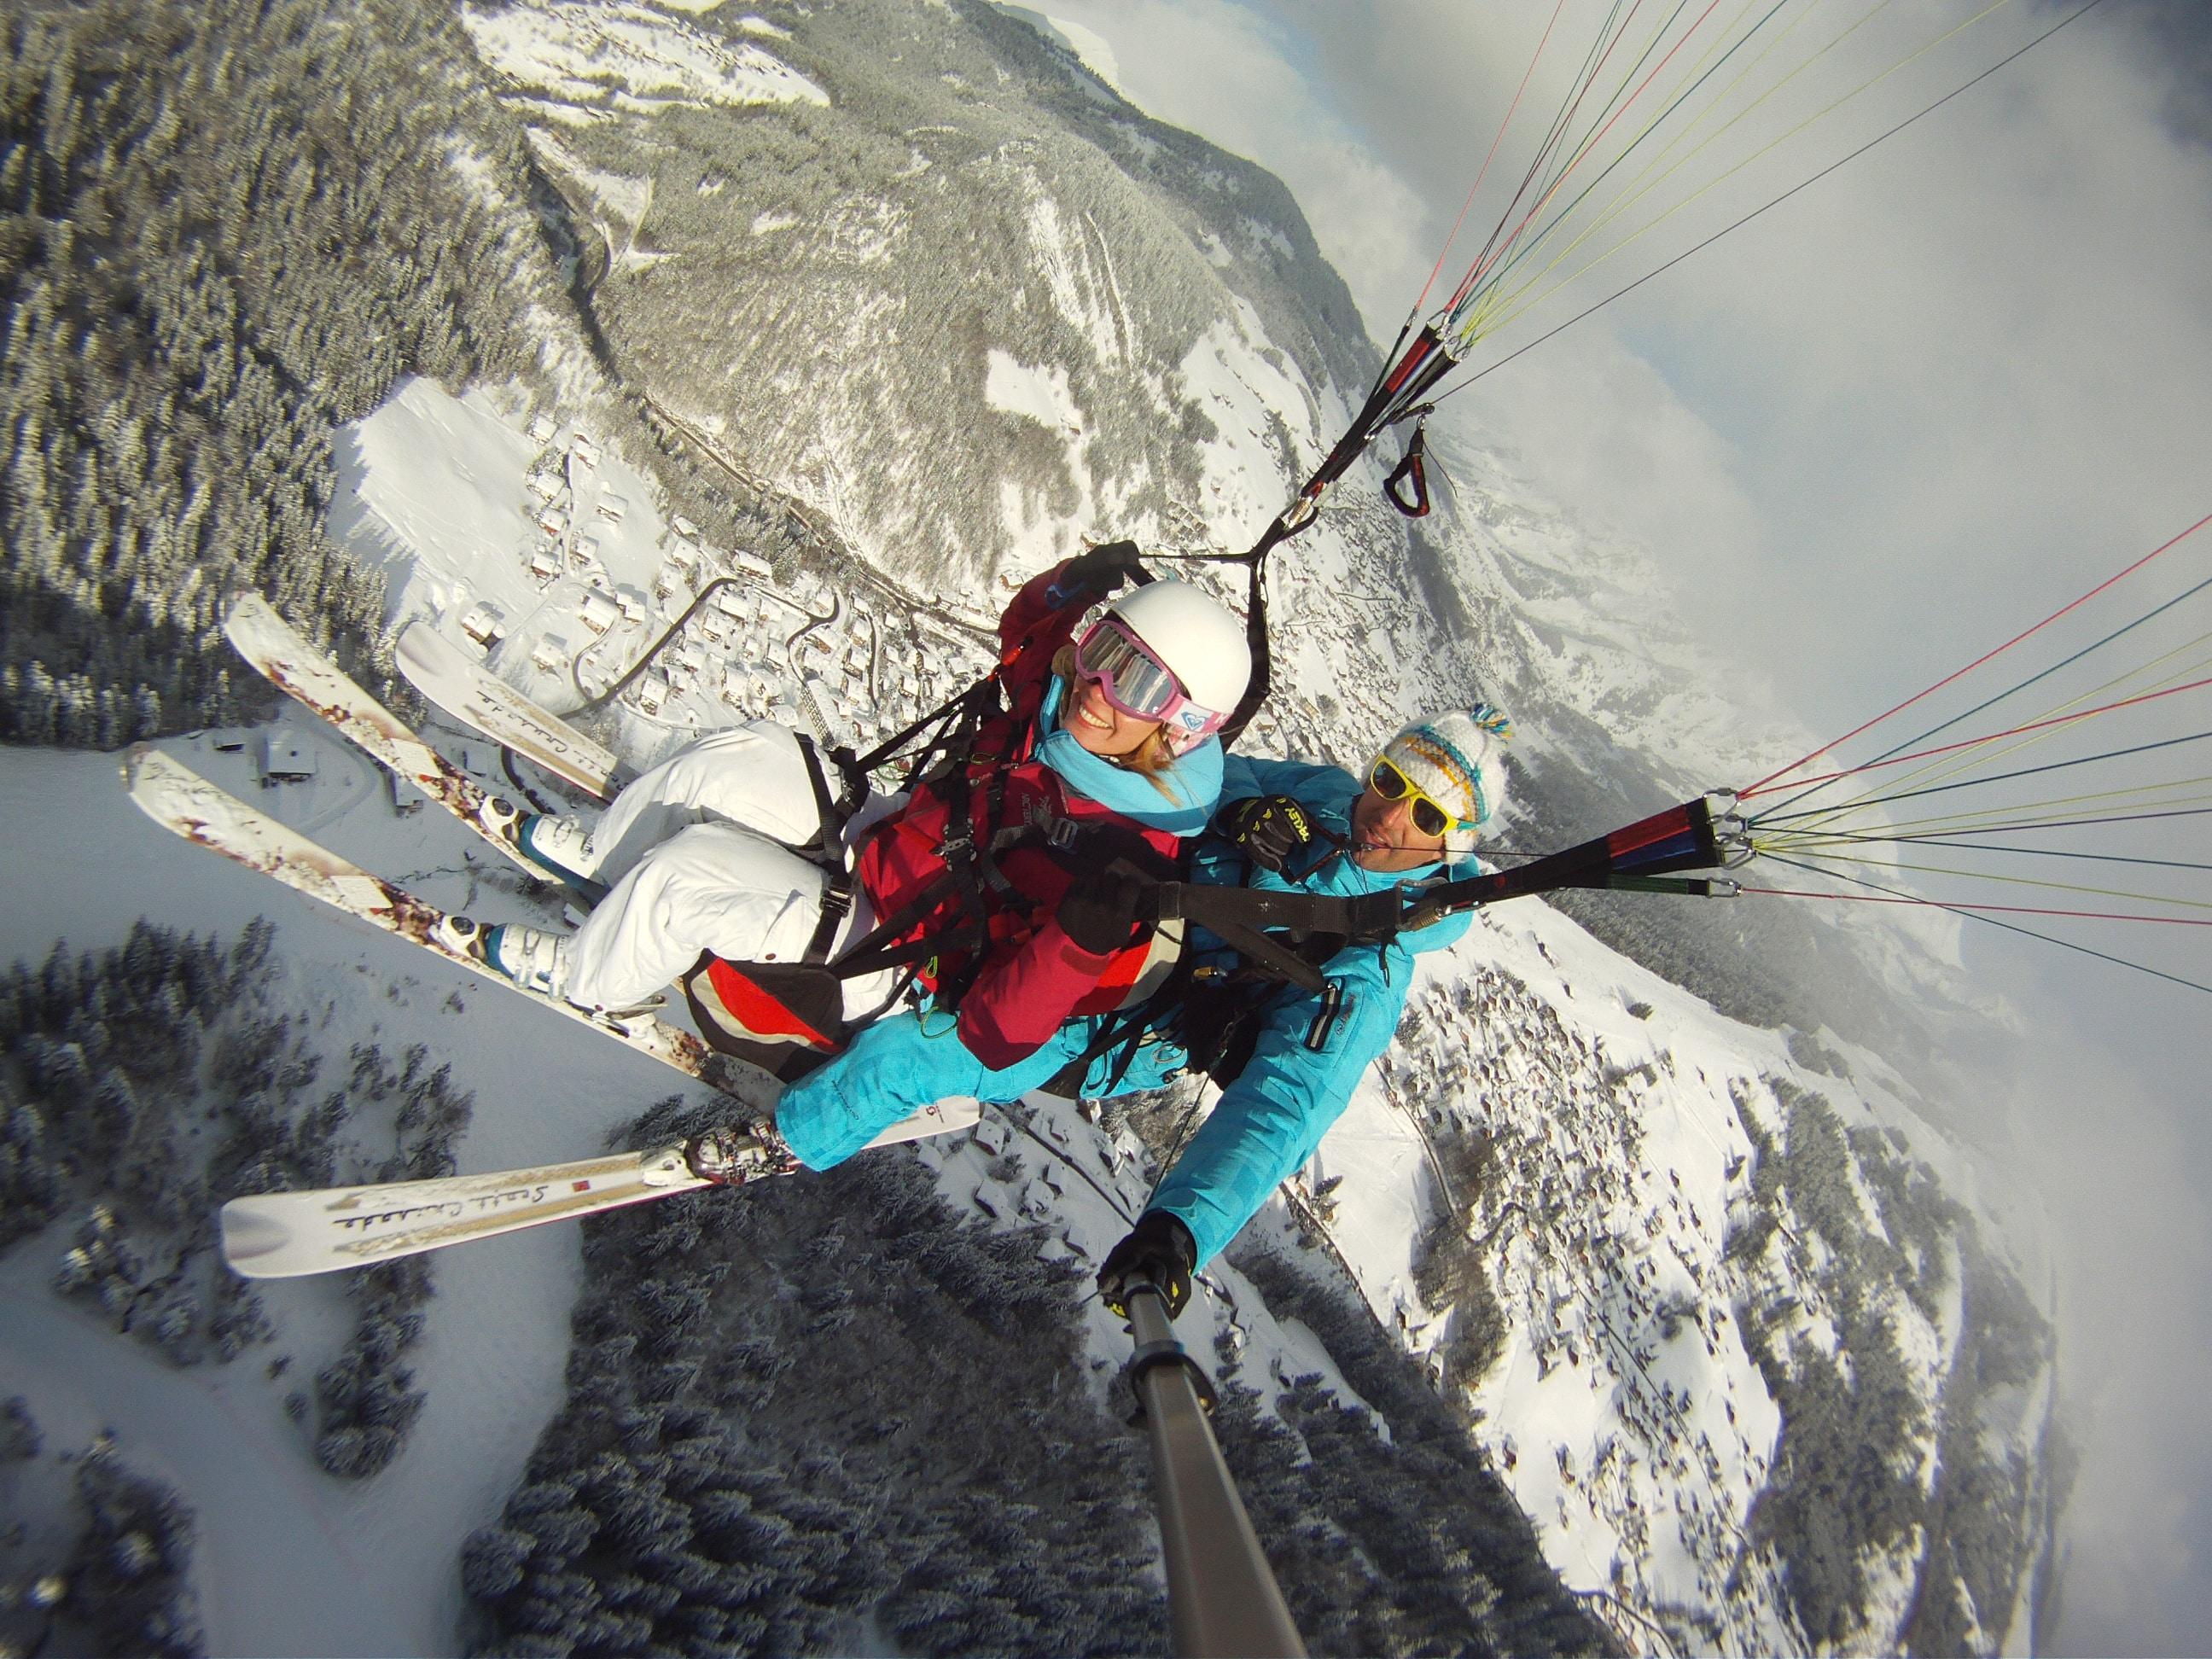 Ski - parapente La clusaz